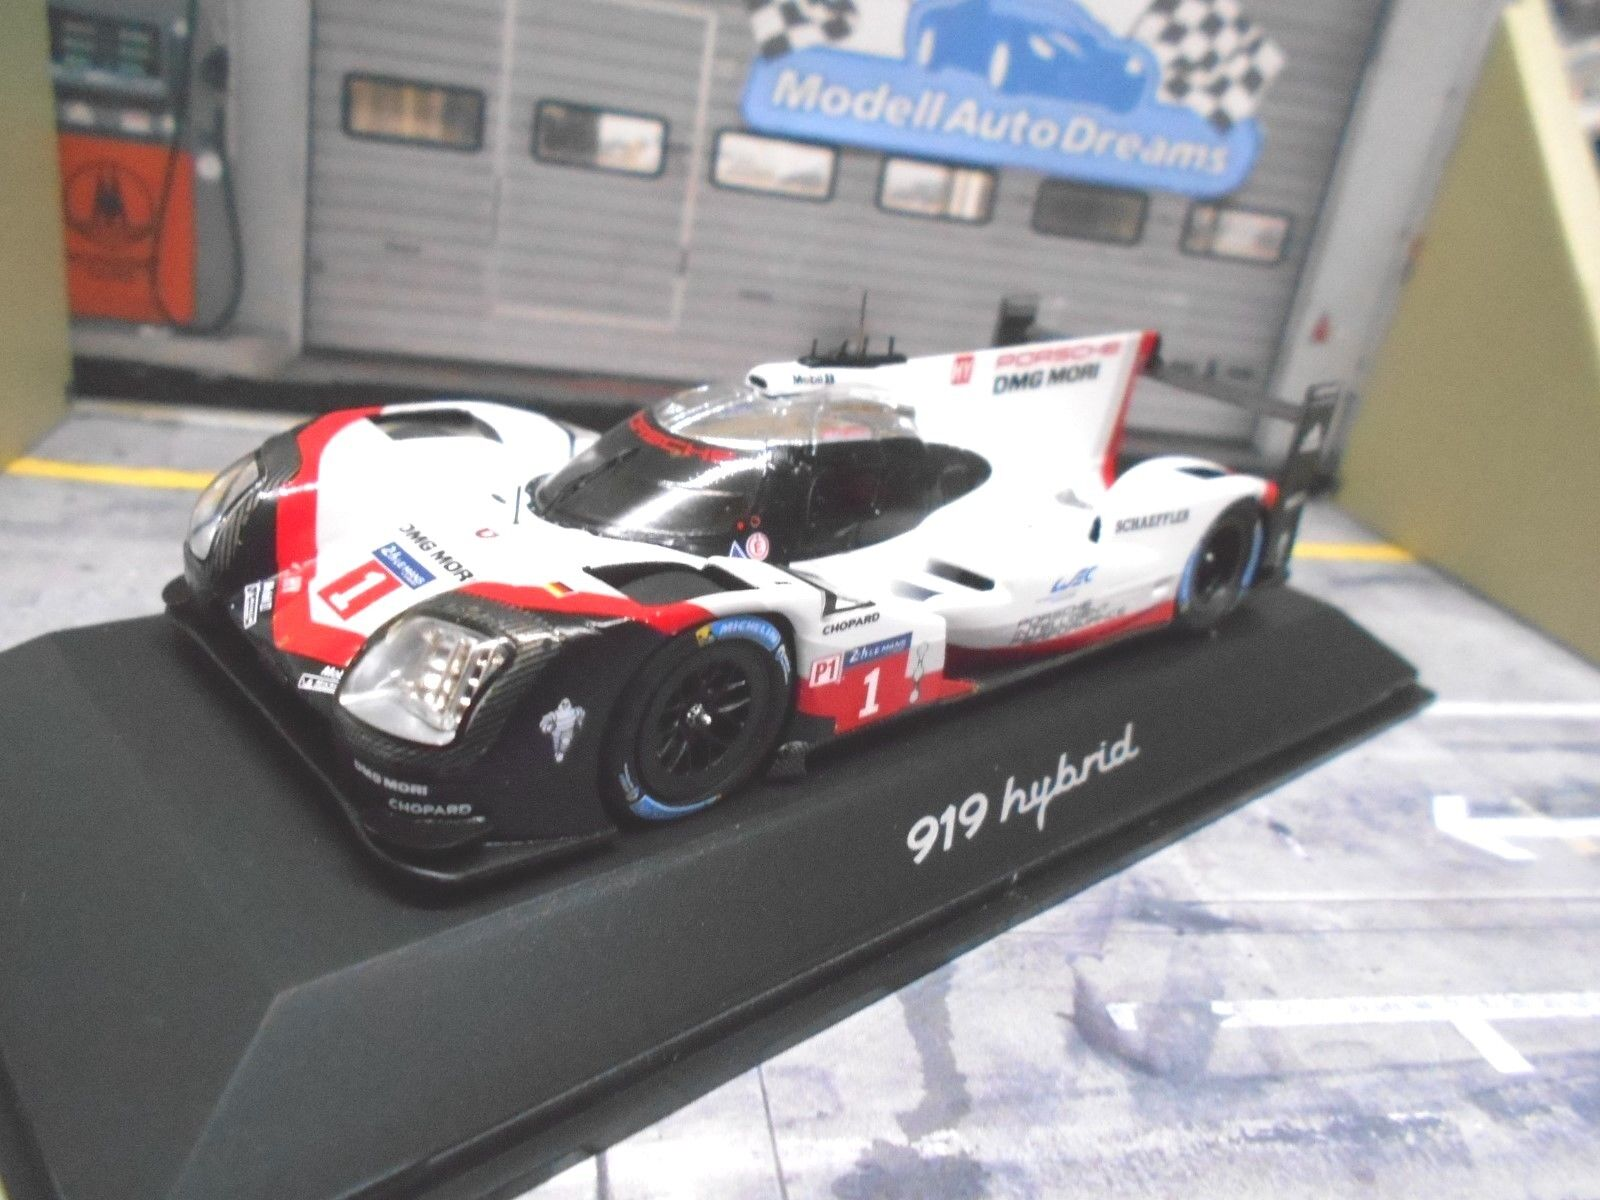 Porsche 919 Hybrid HY LE MANS 2017  1 Test PRESENTATION Lotterer les babioles Spark 1 43